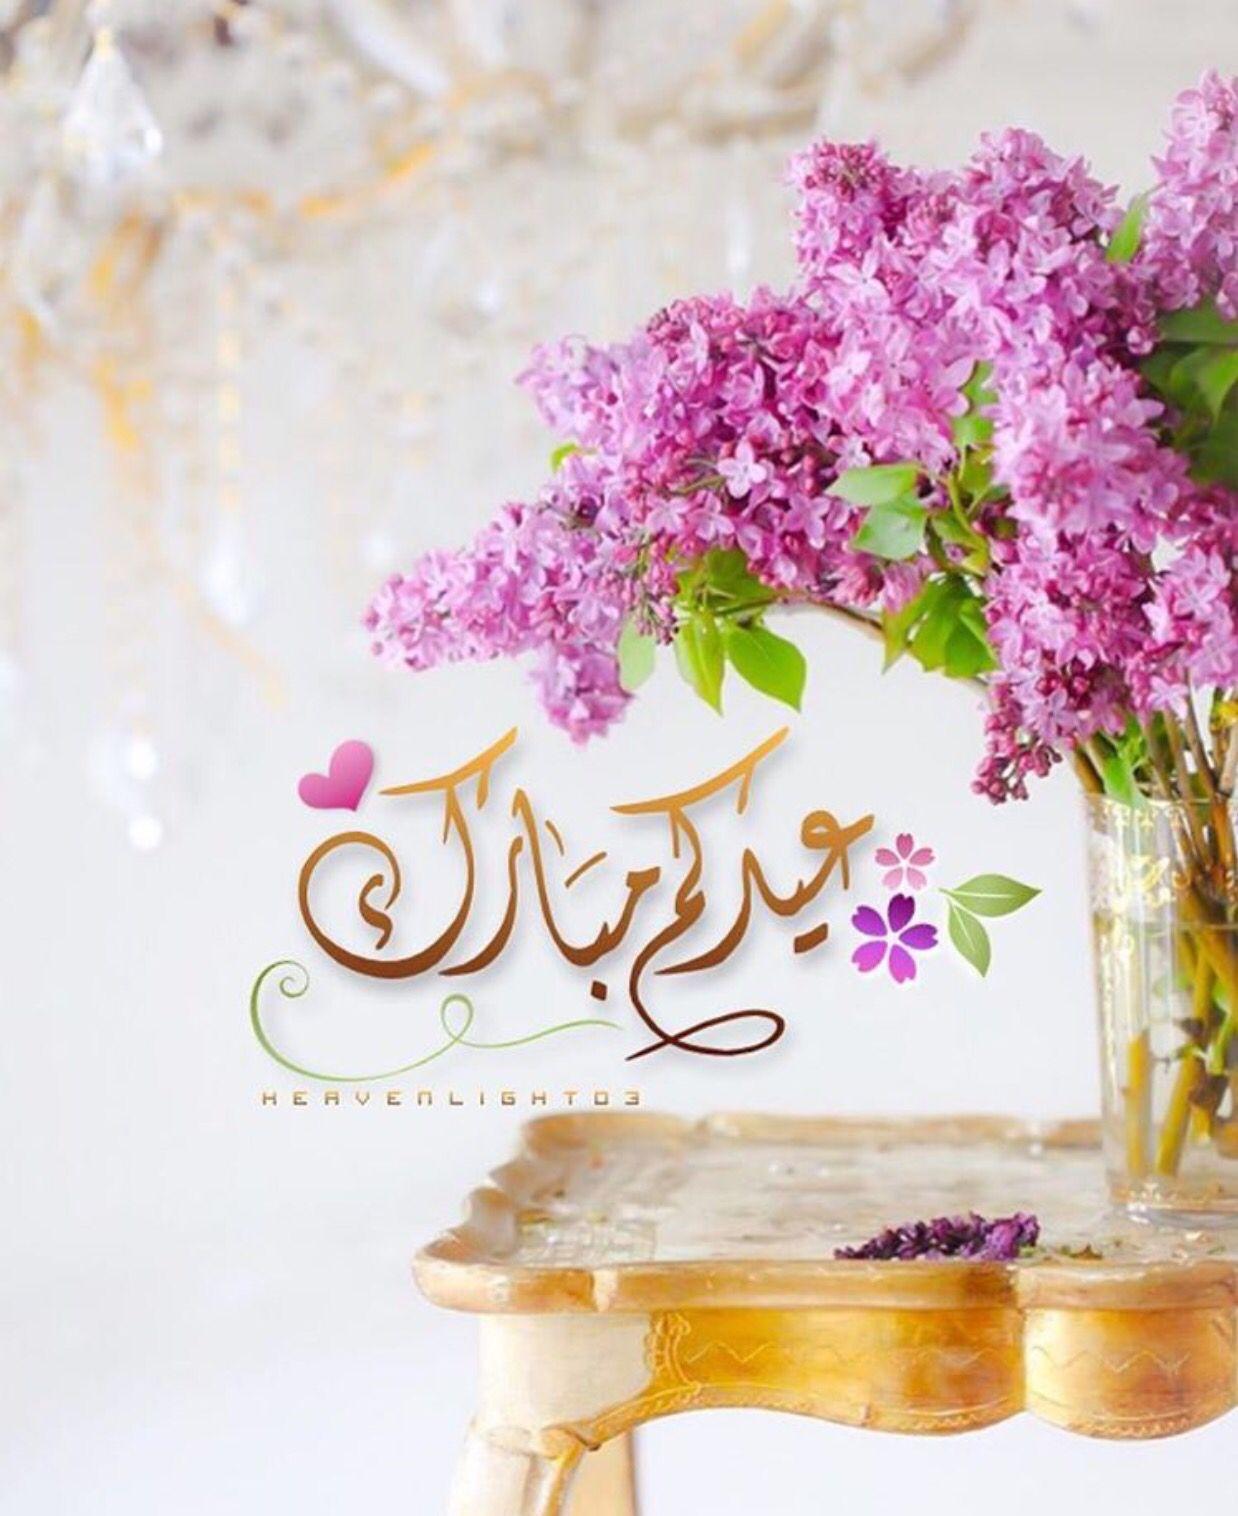 عيدكم مبارك Eid Greetings Eid Mubarak Greetings Eid Cards